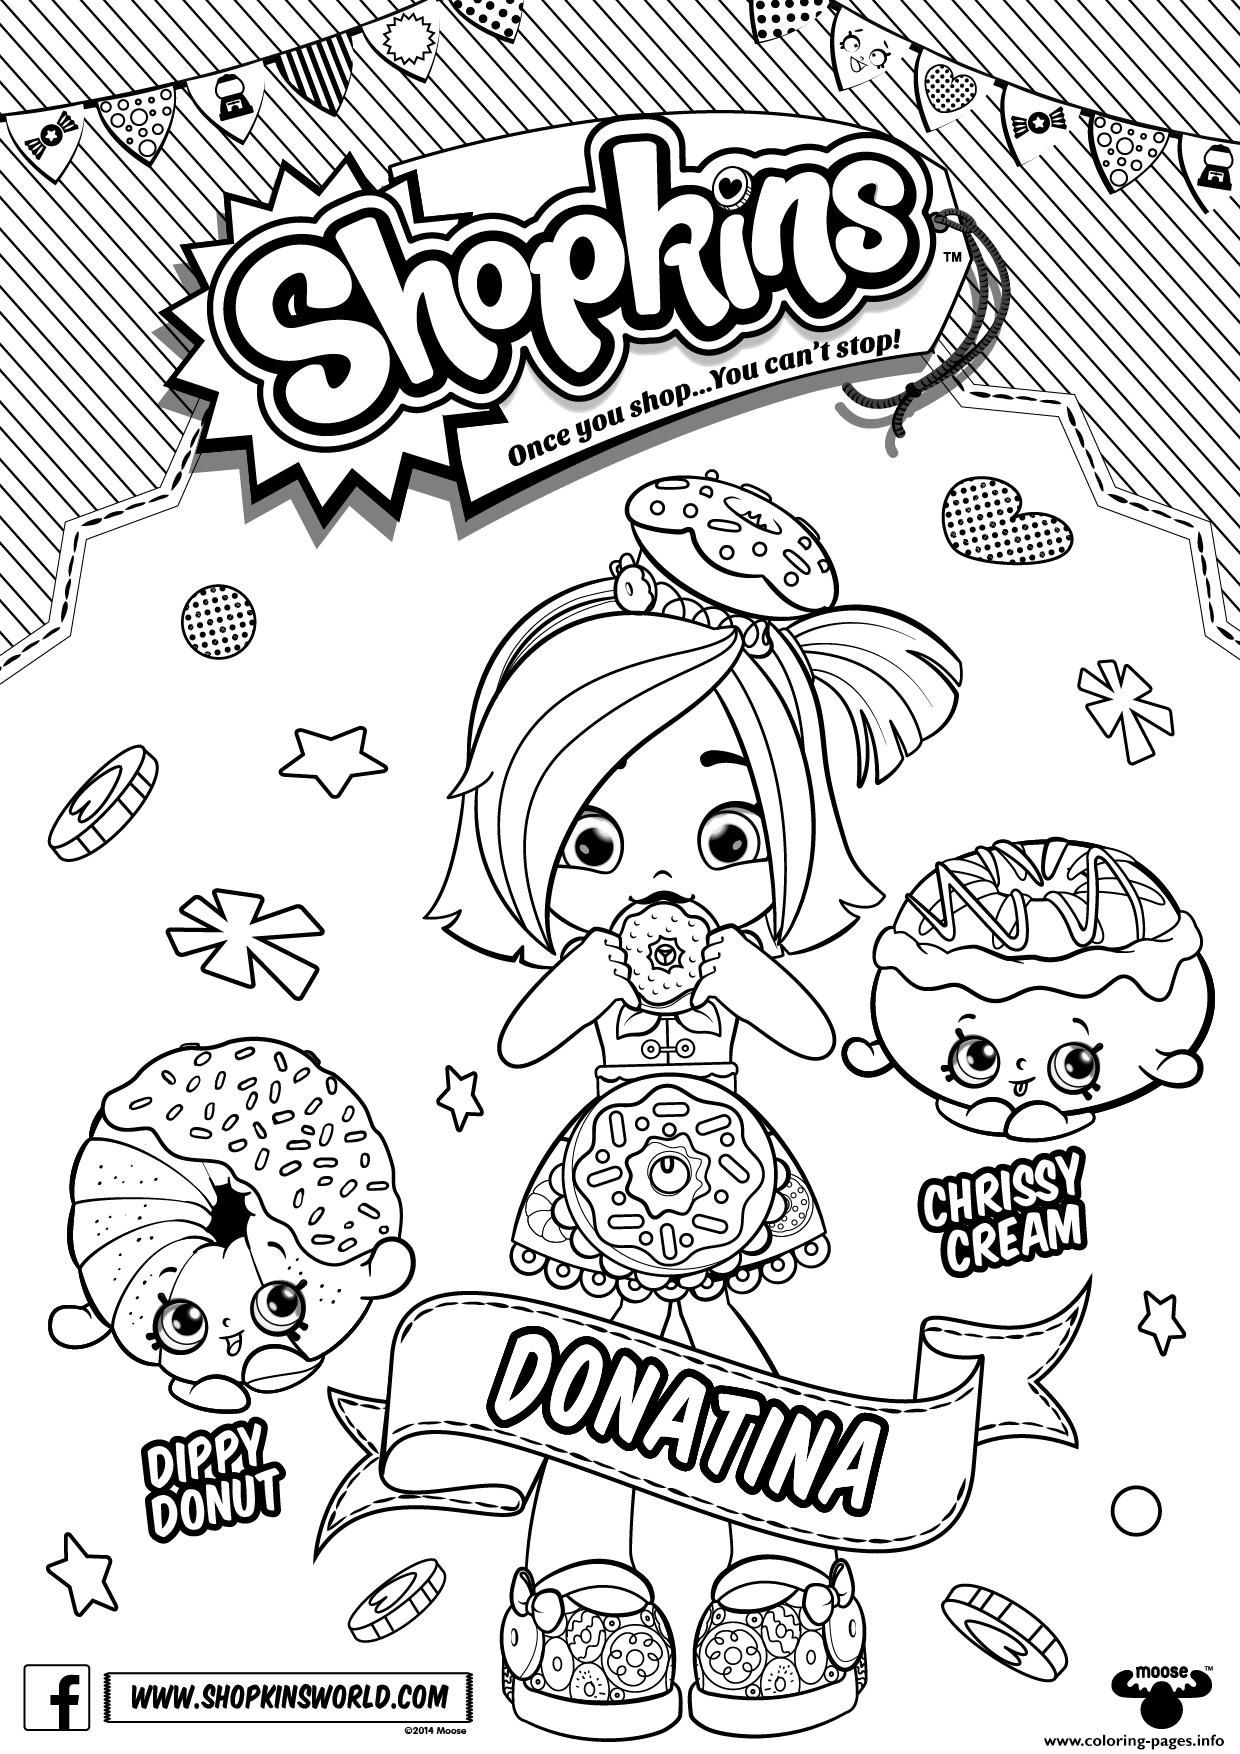 print shopkins season 6 doll chef club donatina coloring